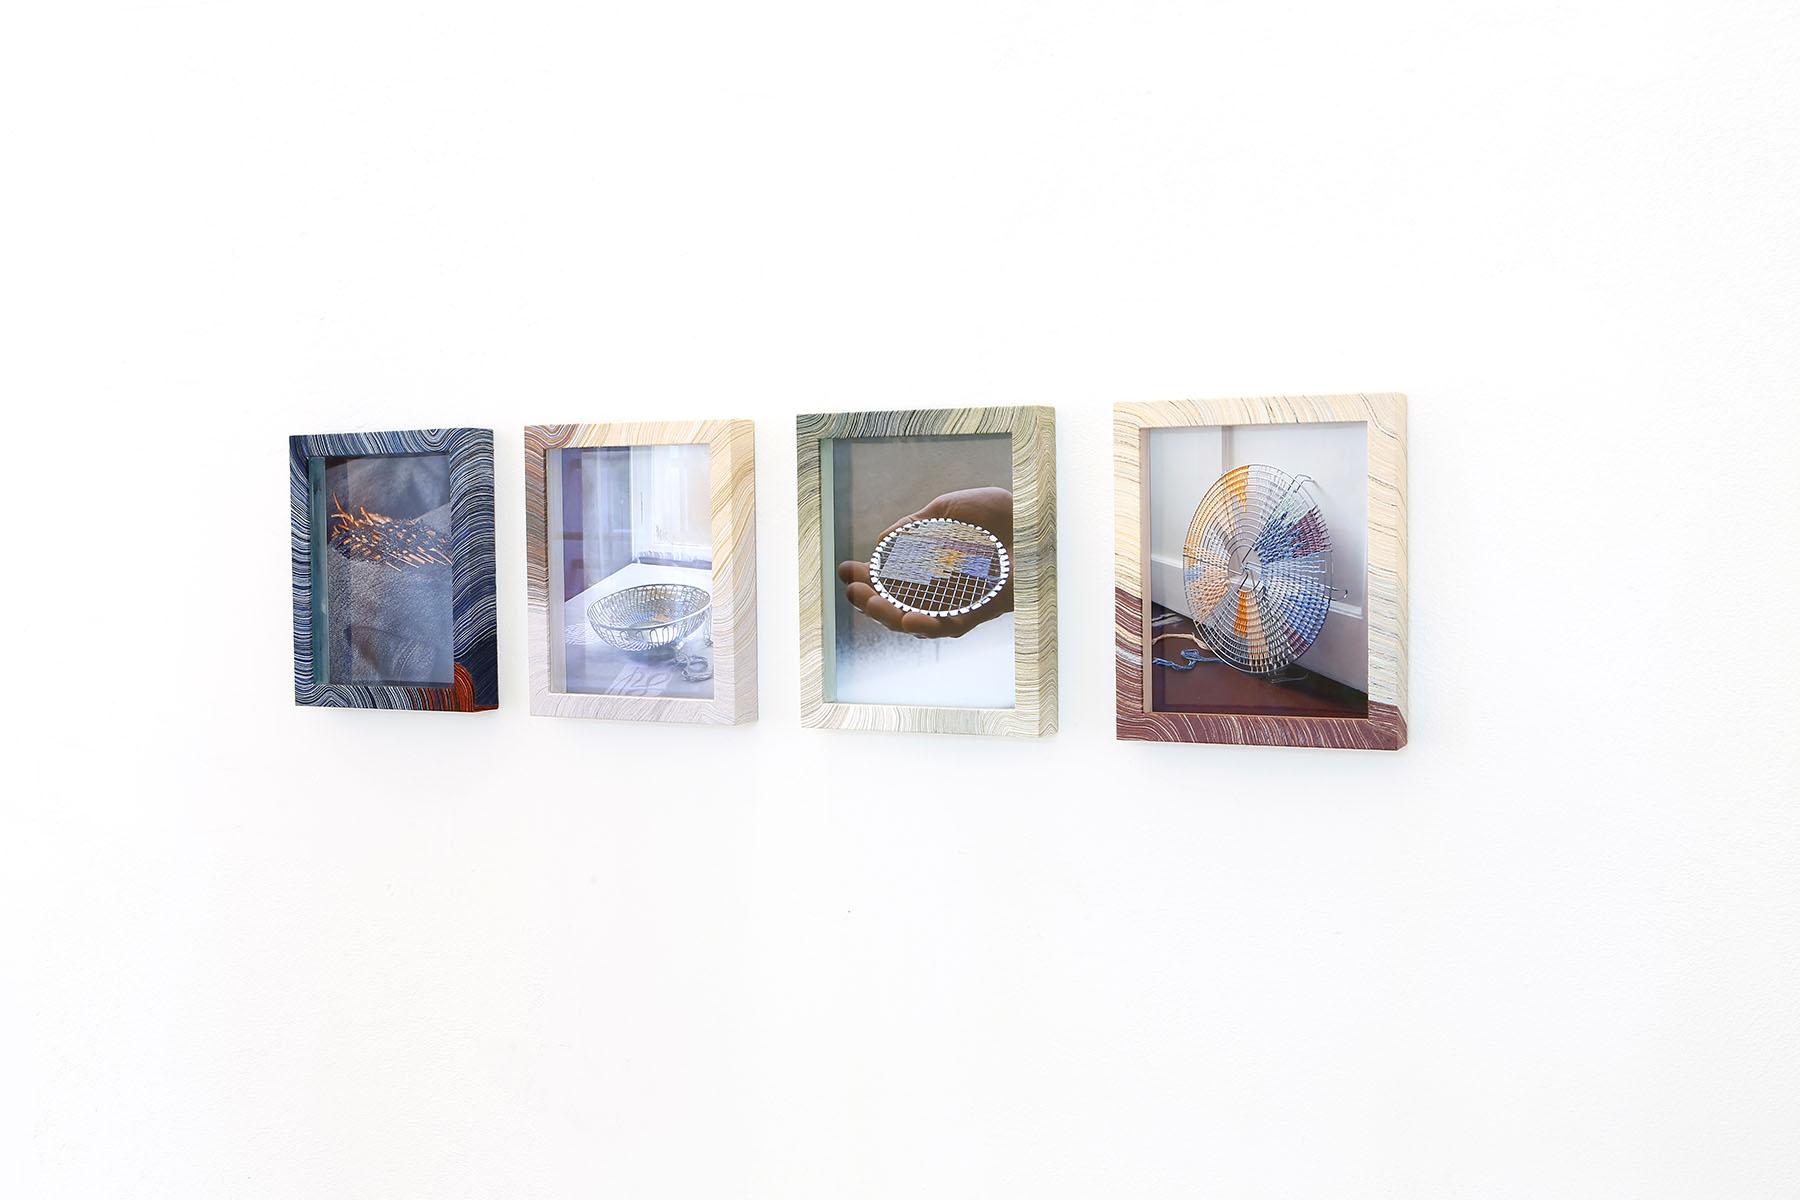 julia grybos, barbora zentkova, artist, barsuglia, images on wall, white,